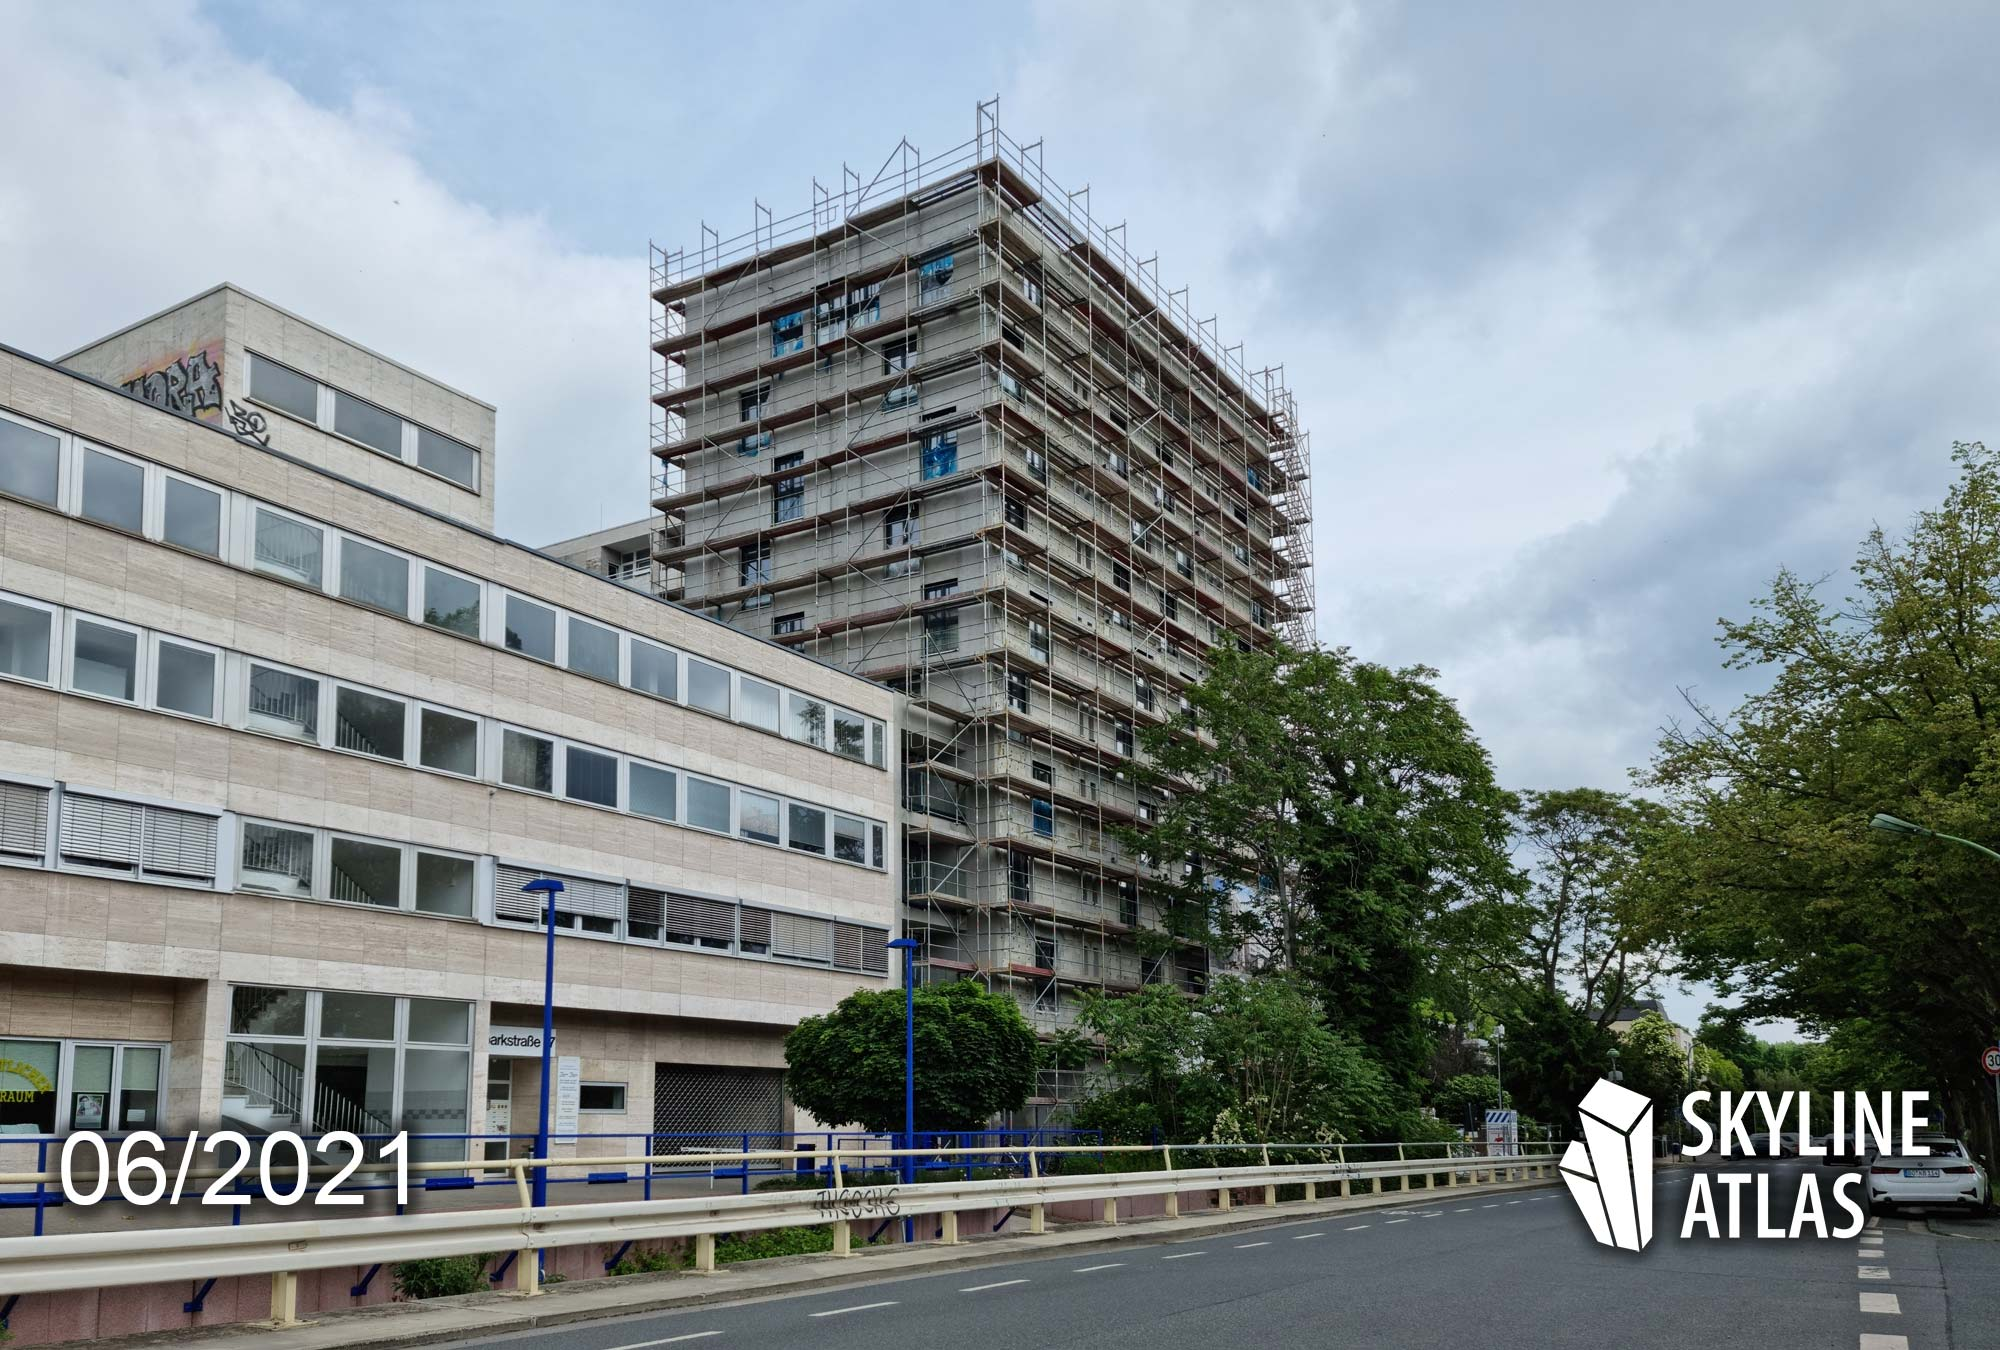 Panorama Residenz Frankfurt - Panroramaresidenz FFM - Neubau Ostend - Frankfurt Neubau Wohnungen - Juni 2021